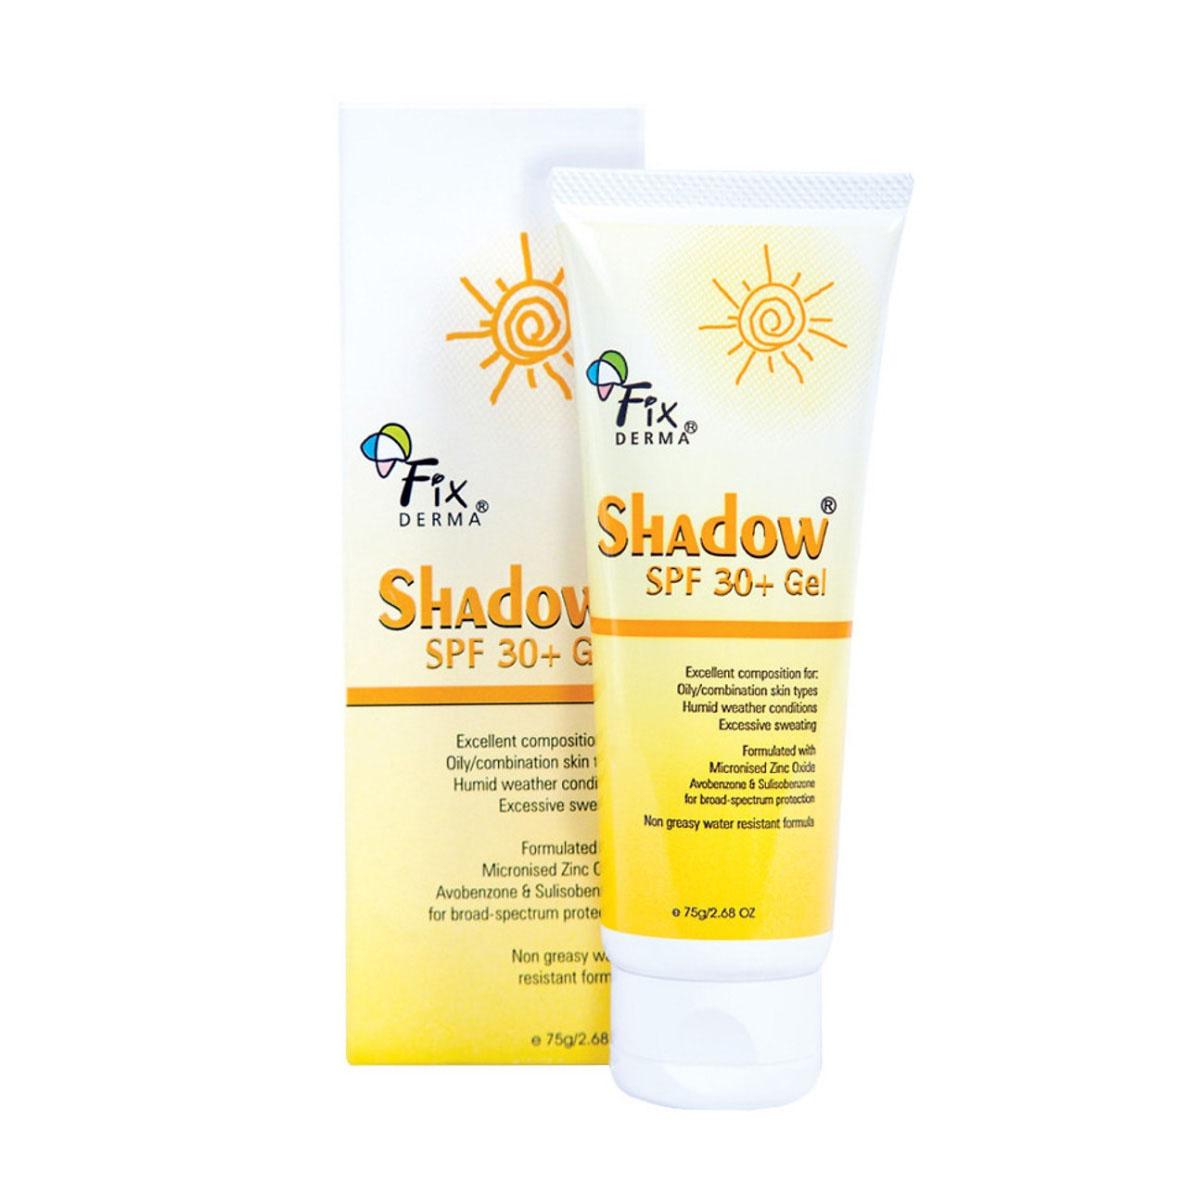 Gel Chống Nắng Da Mặt Fixderma Shadow SPF 30+ (75g)